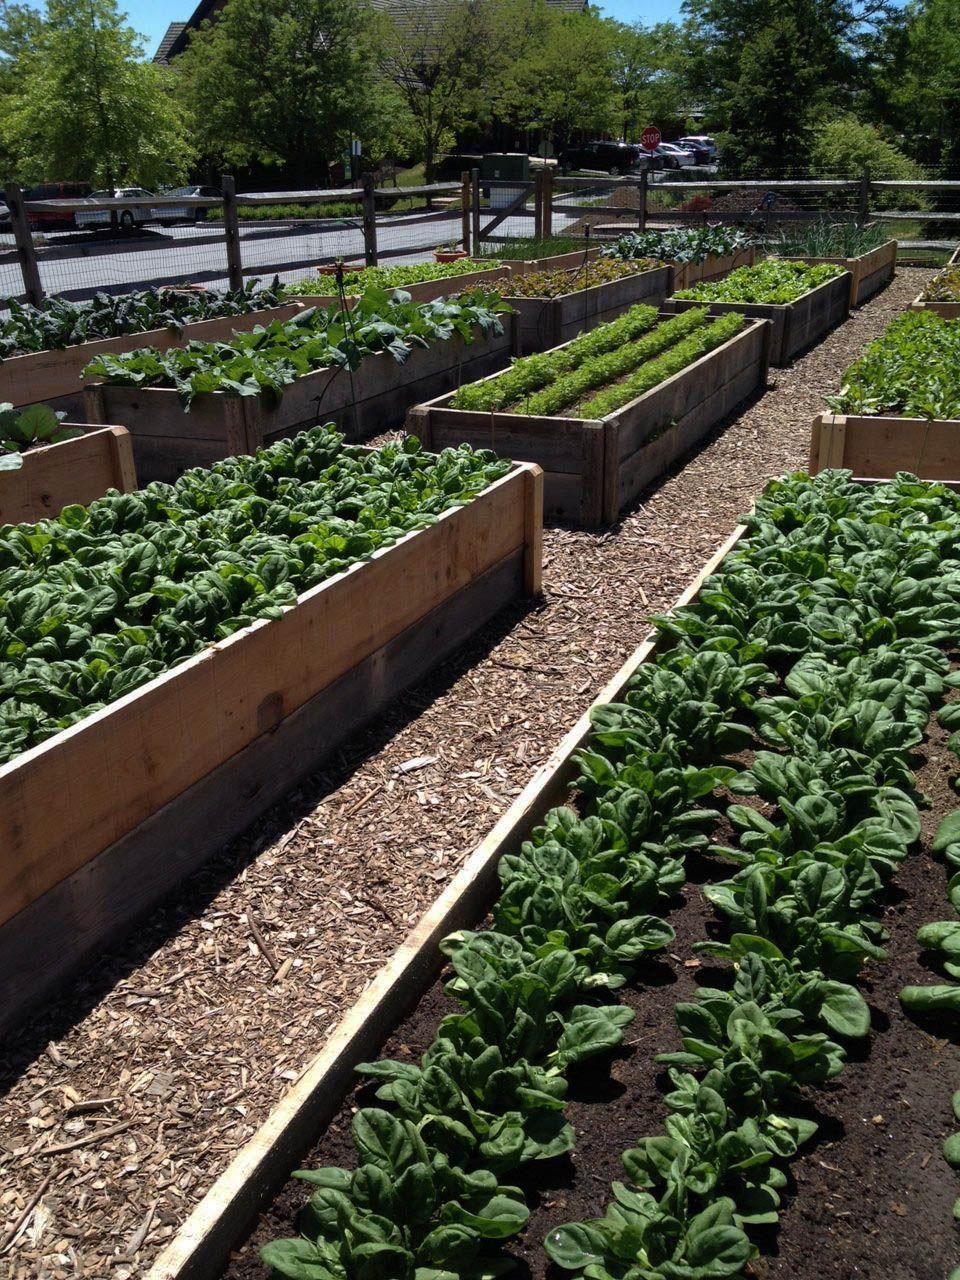 Modele De Jardin Luxe 15 Raised Bed Garden Concept Suggestions Of 60 Luxe Modele De Jardin